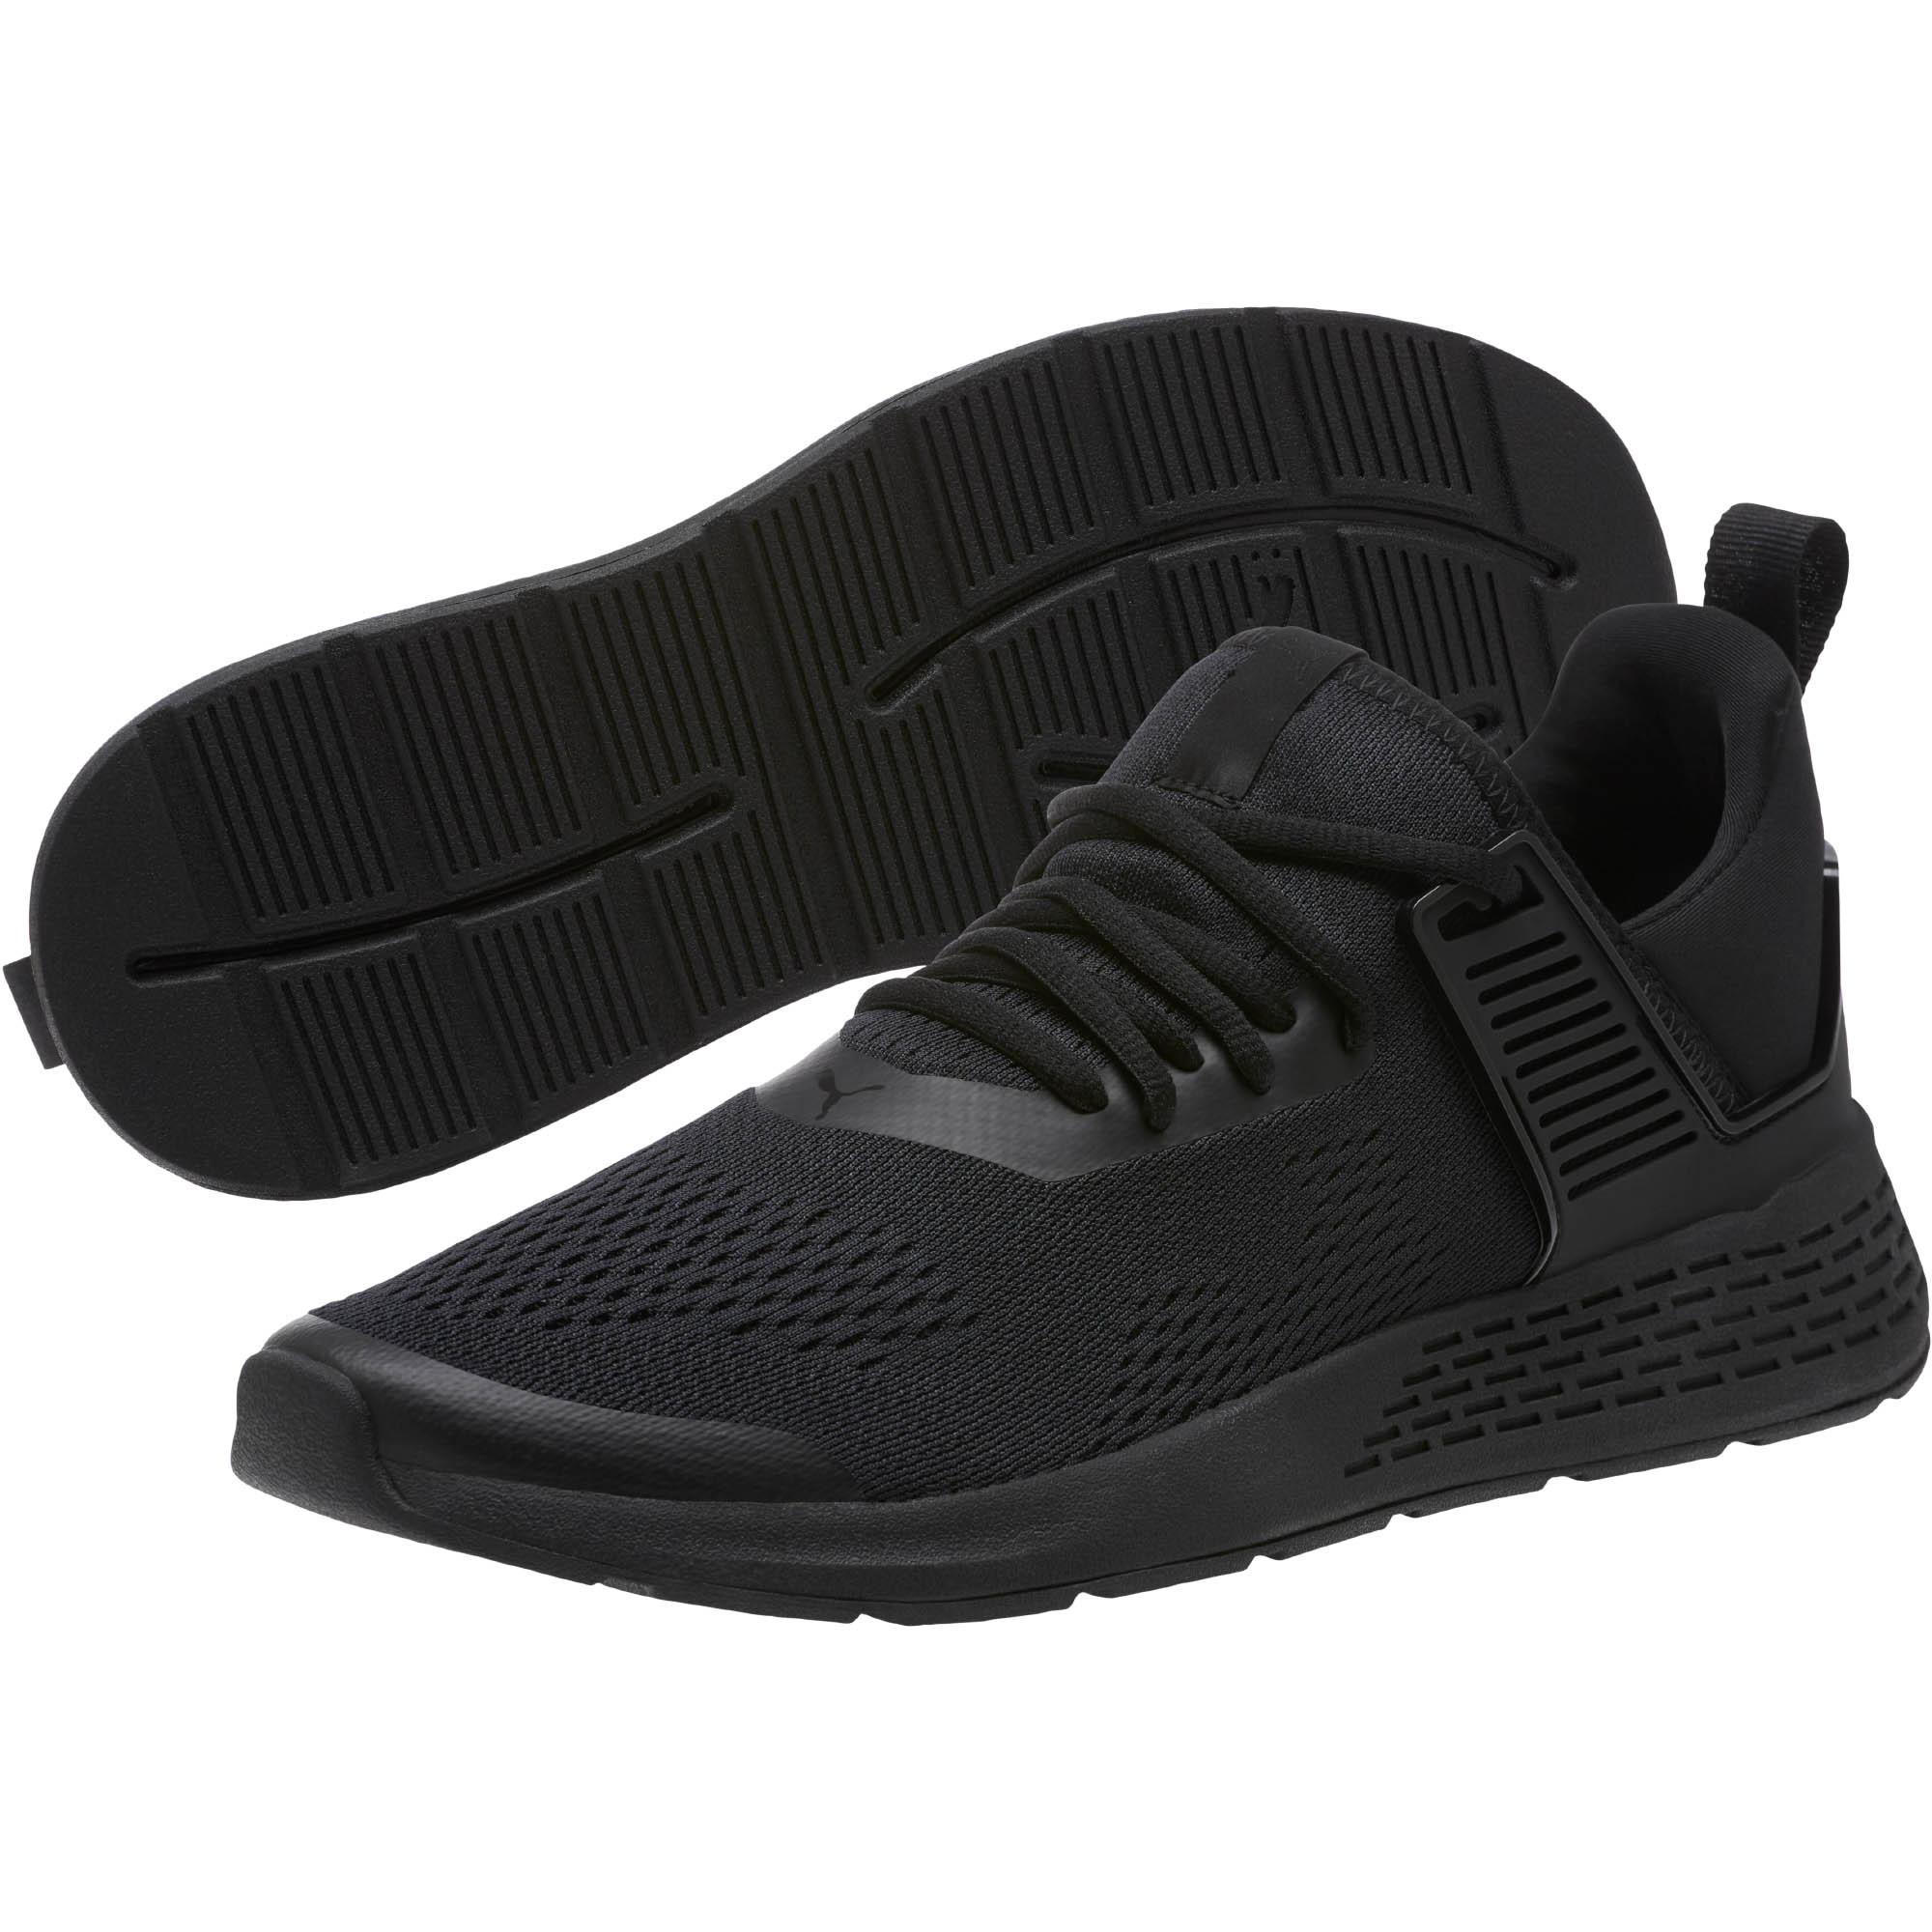 73c97a9f33a Official Puma Store  PUMA Insurge Eng Mesh Sneakers